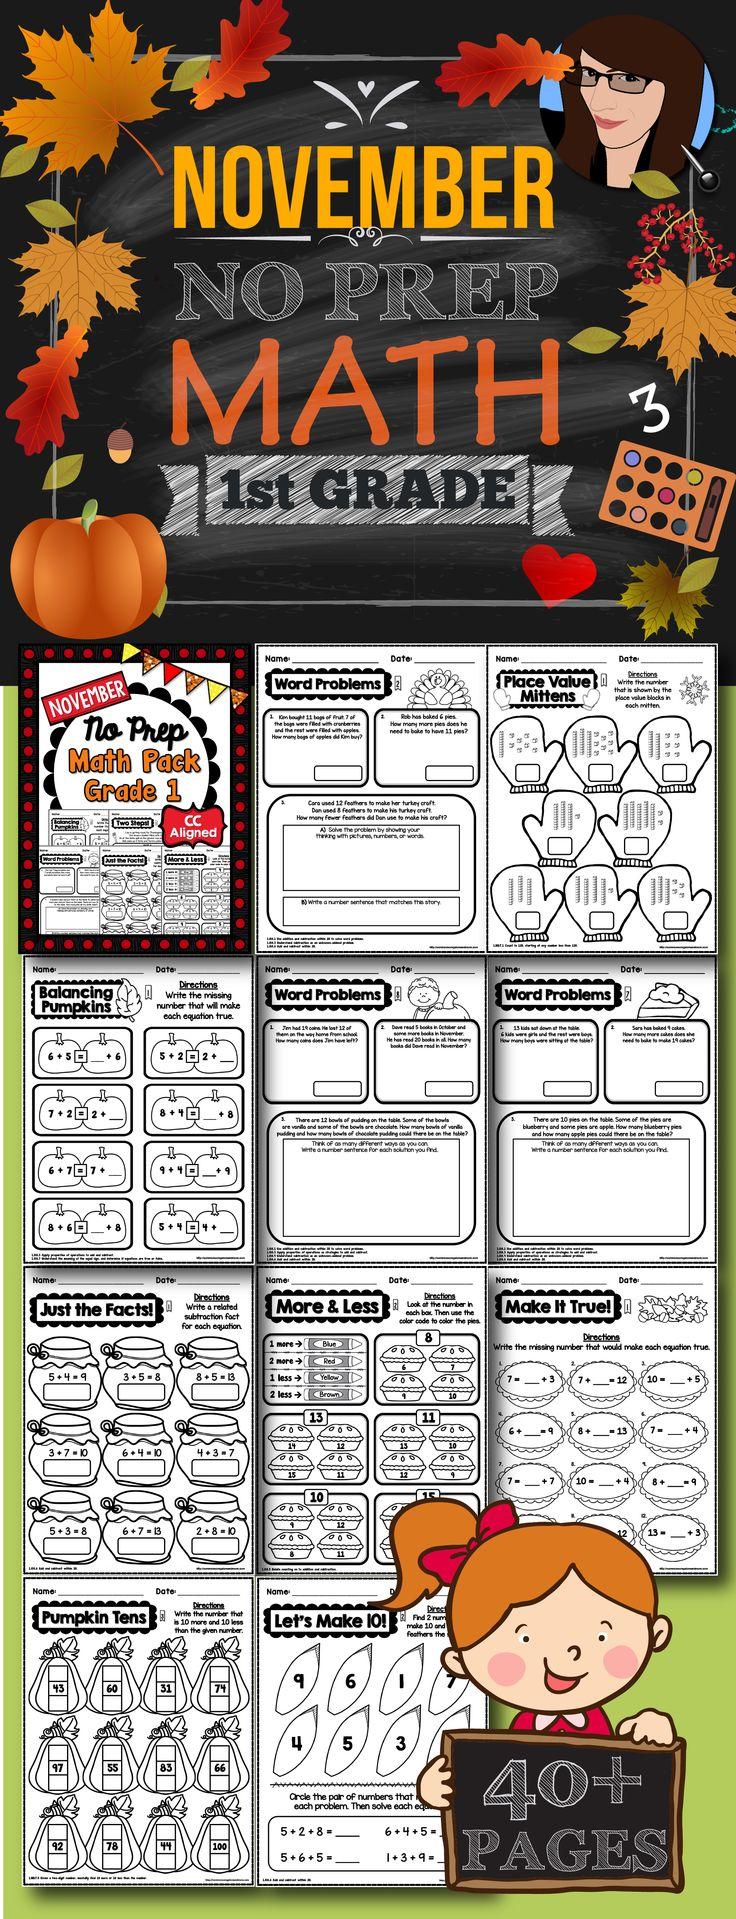 Fine School Math Prep Photo - Math Worksheets Ideas - turkishmedals.net